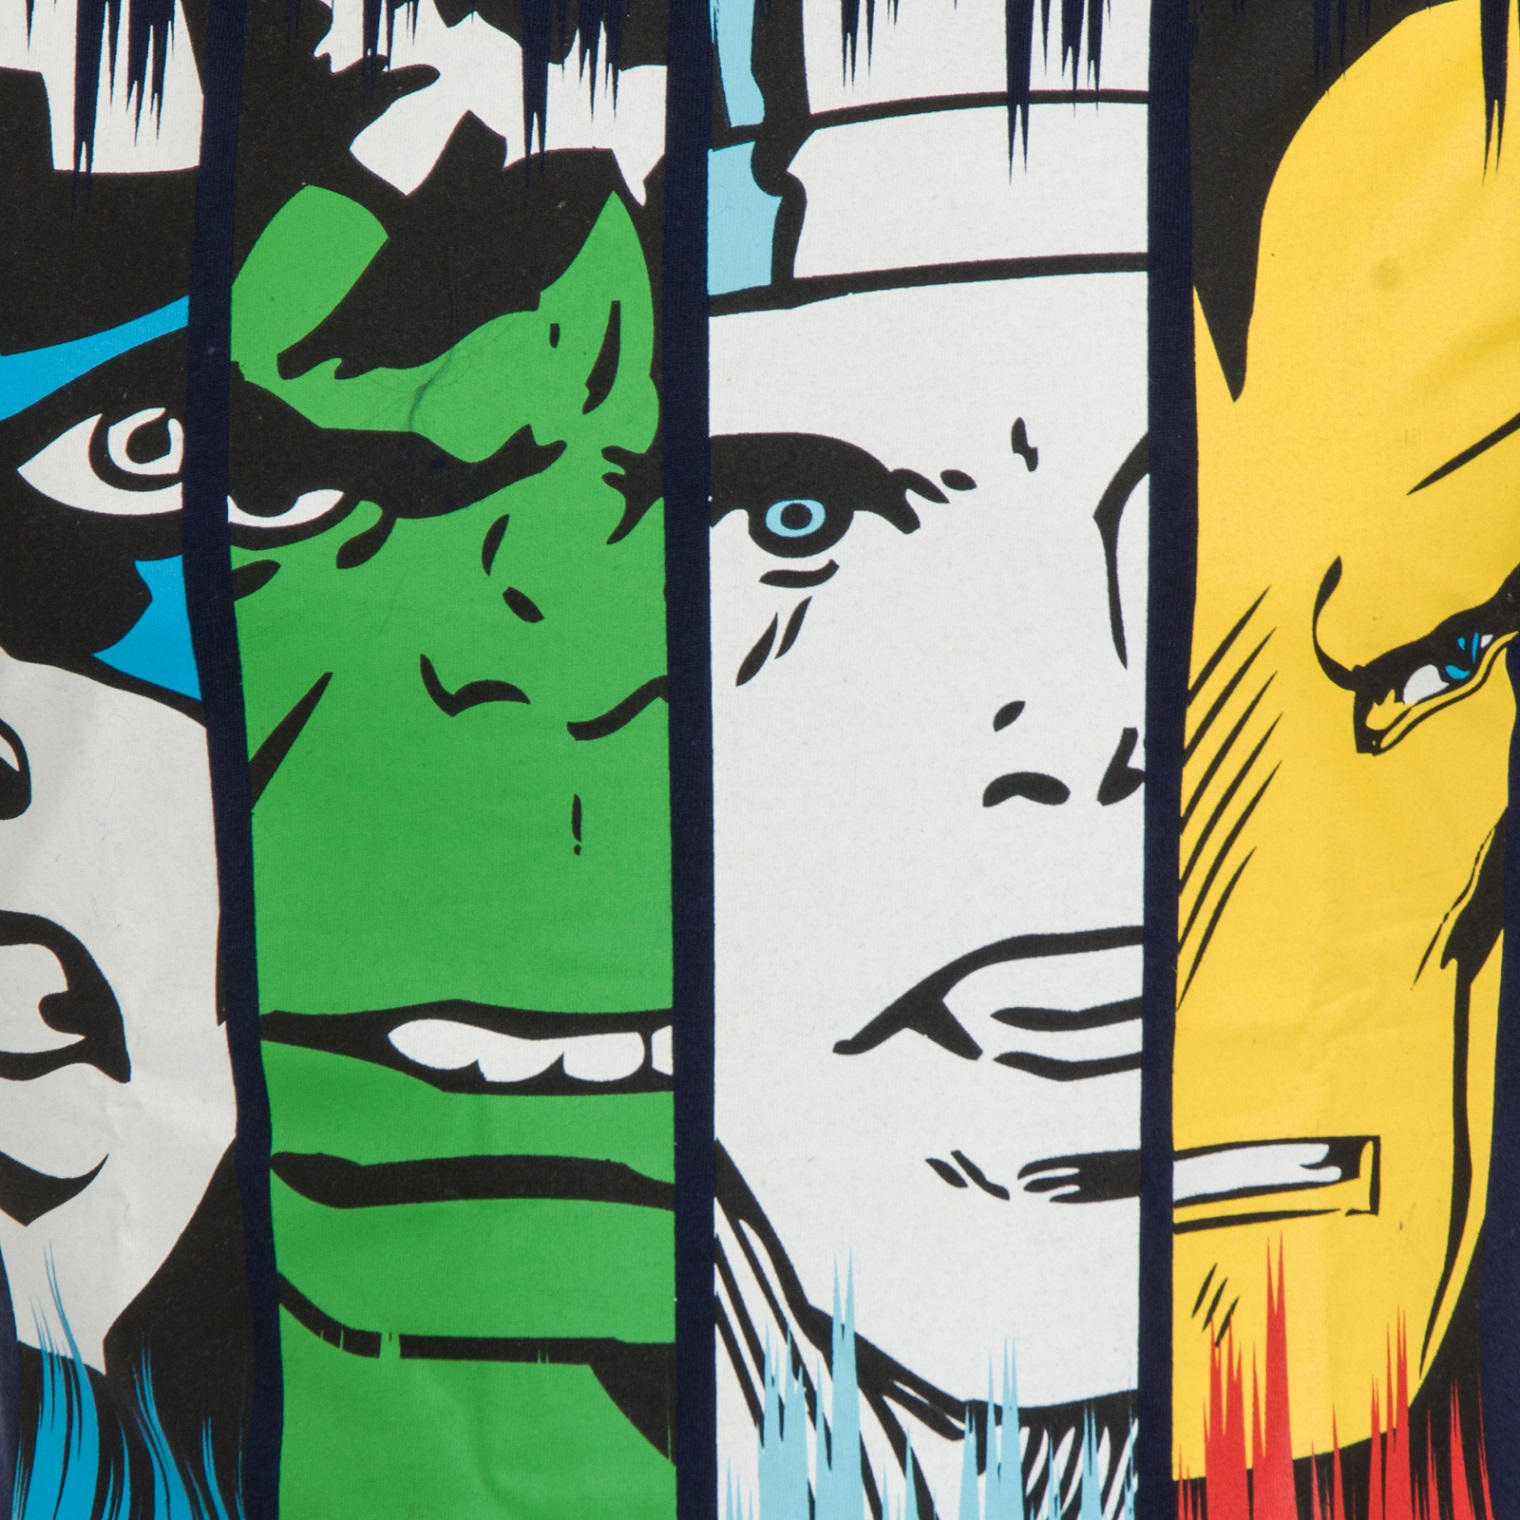 Marvel-Comics-Official-Gift-Boys-Kids-Character-T-Shirt-Hulk-Iron-Man-Thor thumbnail 10